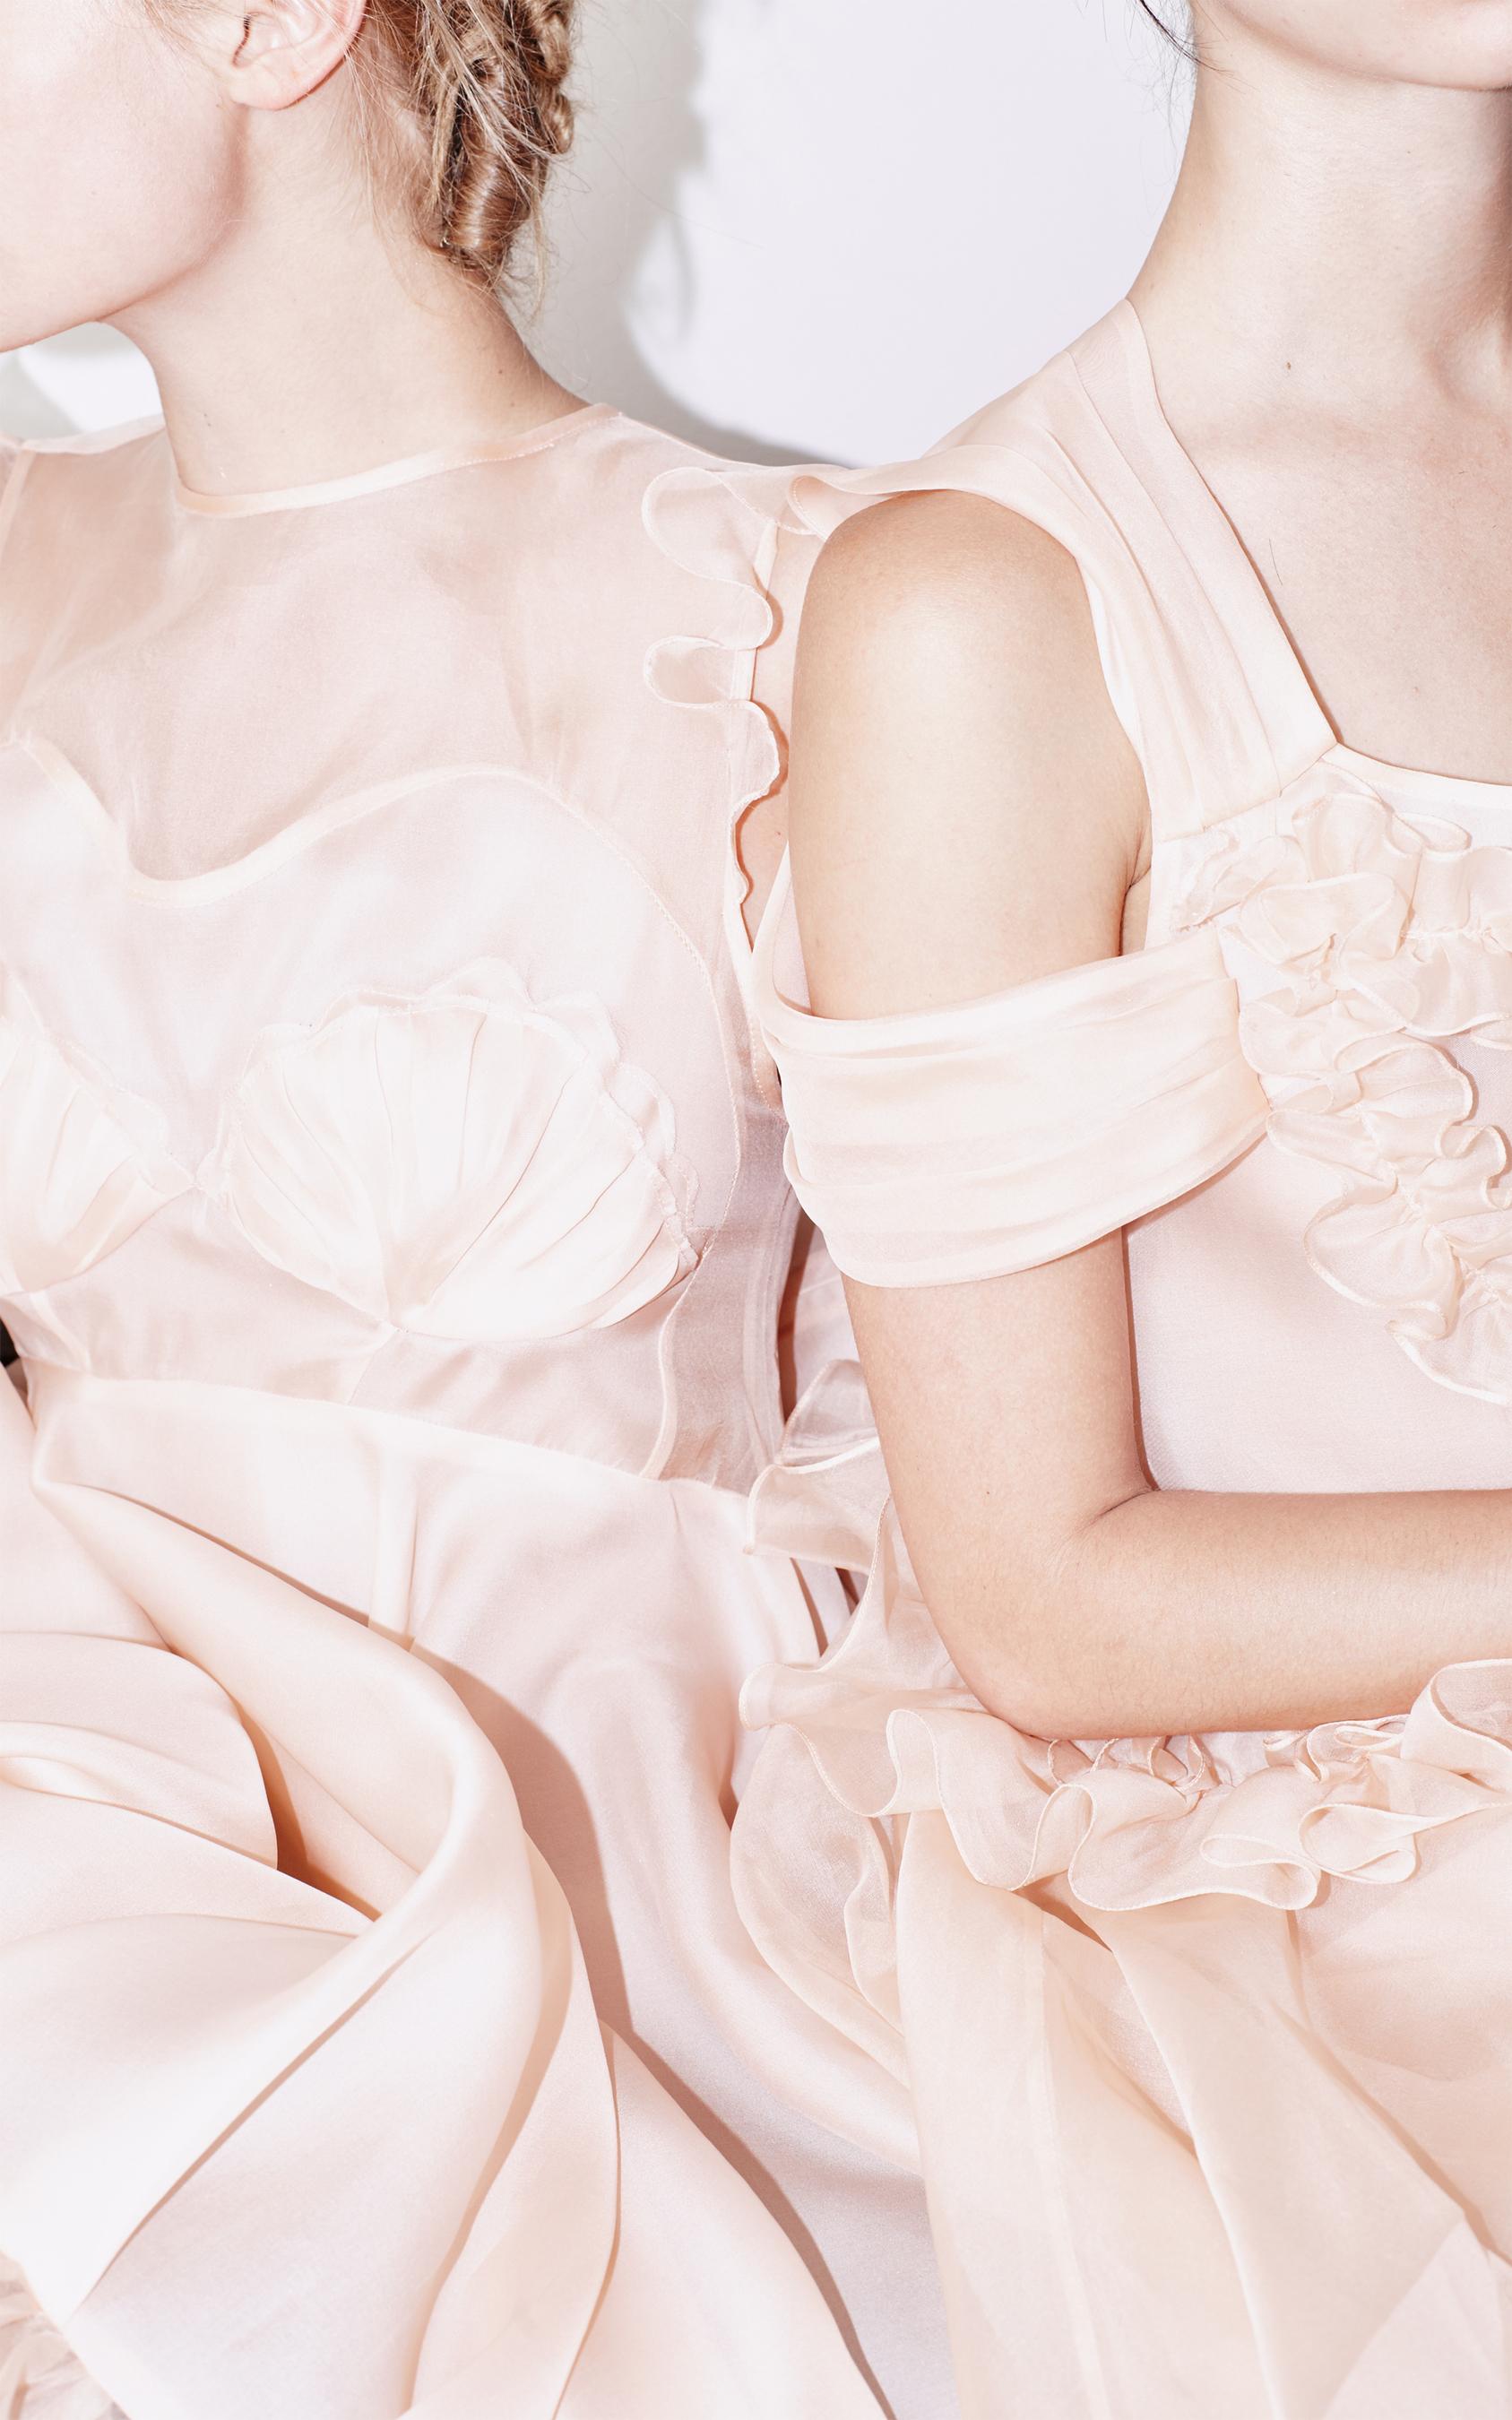 kelsey randall peach pink ballet silk organza mermaid seashell cinderella ruffle tiered flounce babydoll cute swing shoulder drape detail cute romantic sweet inspo